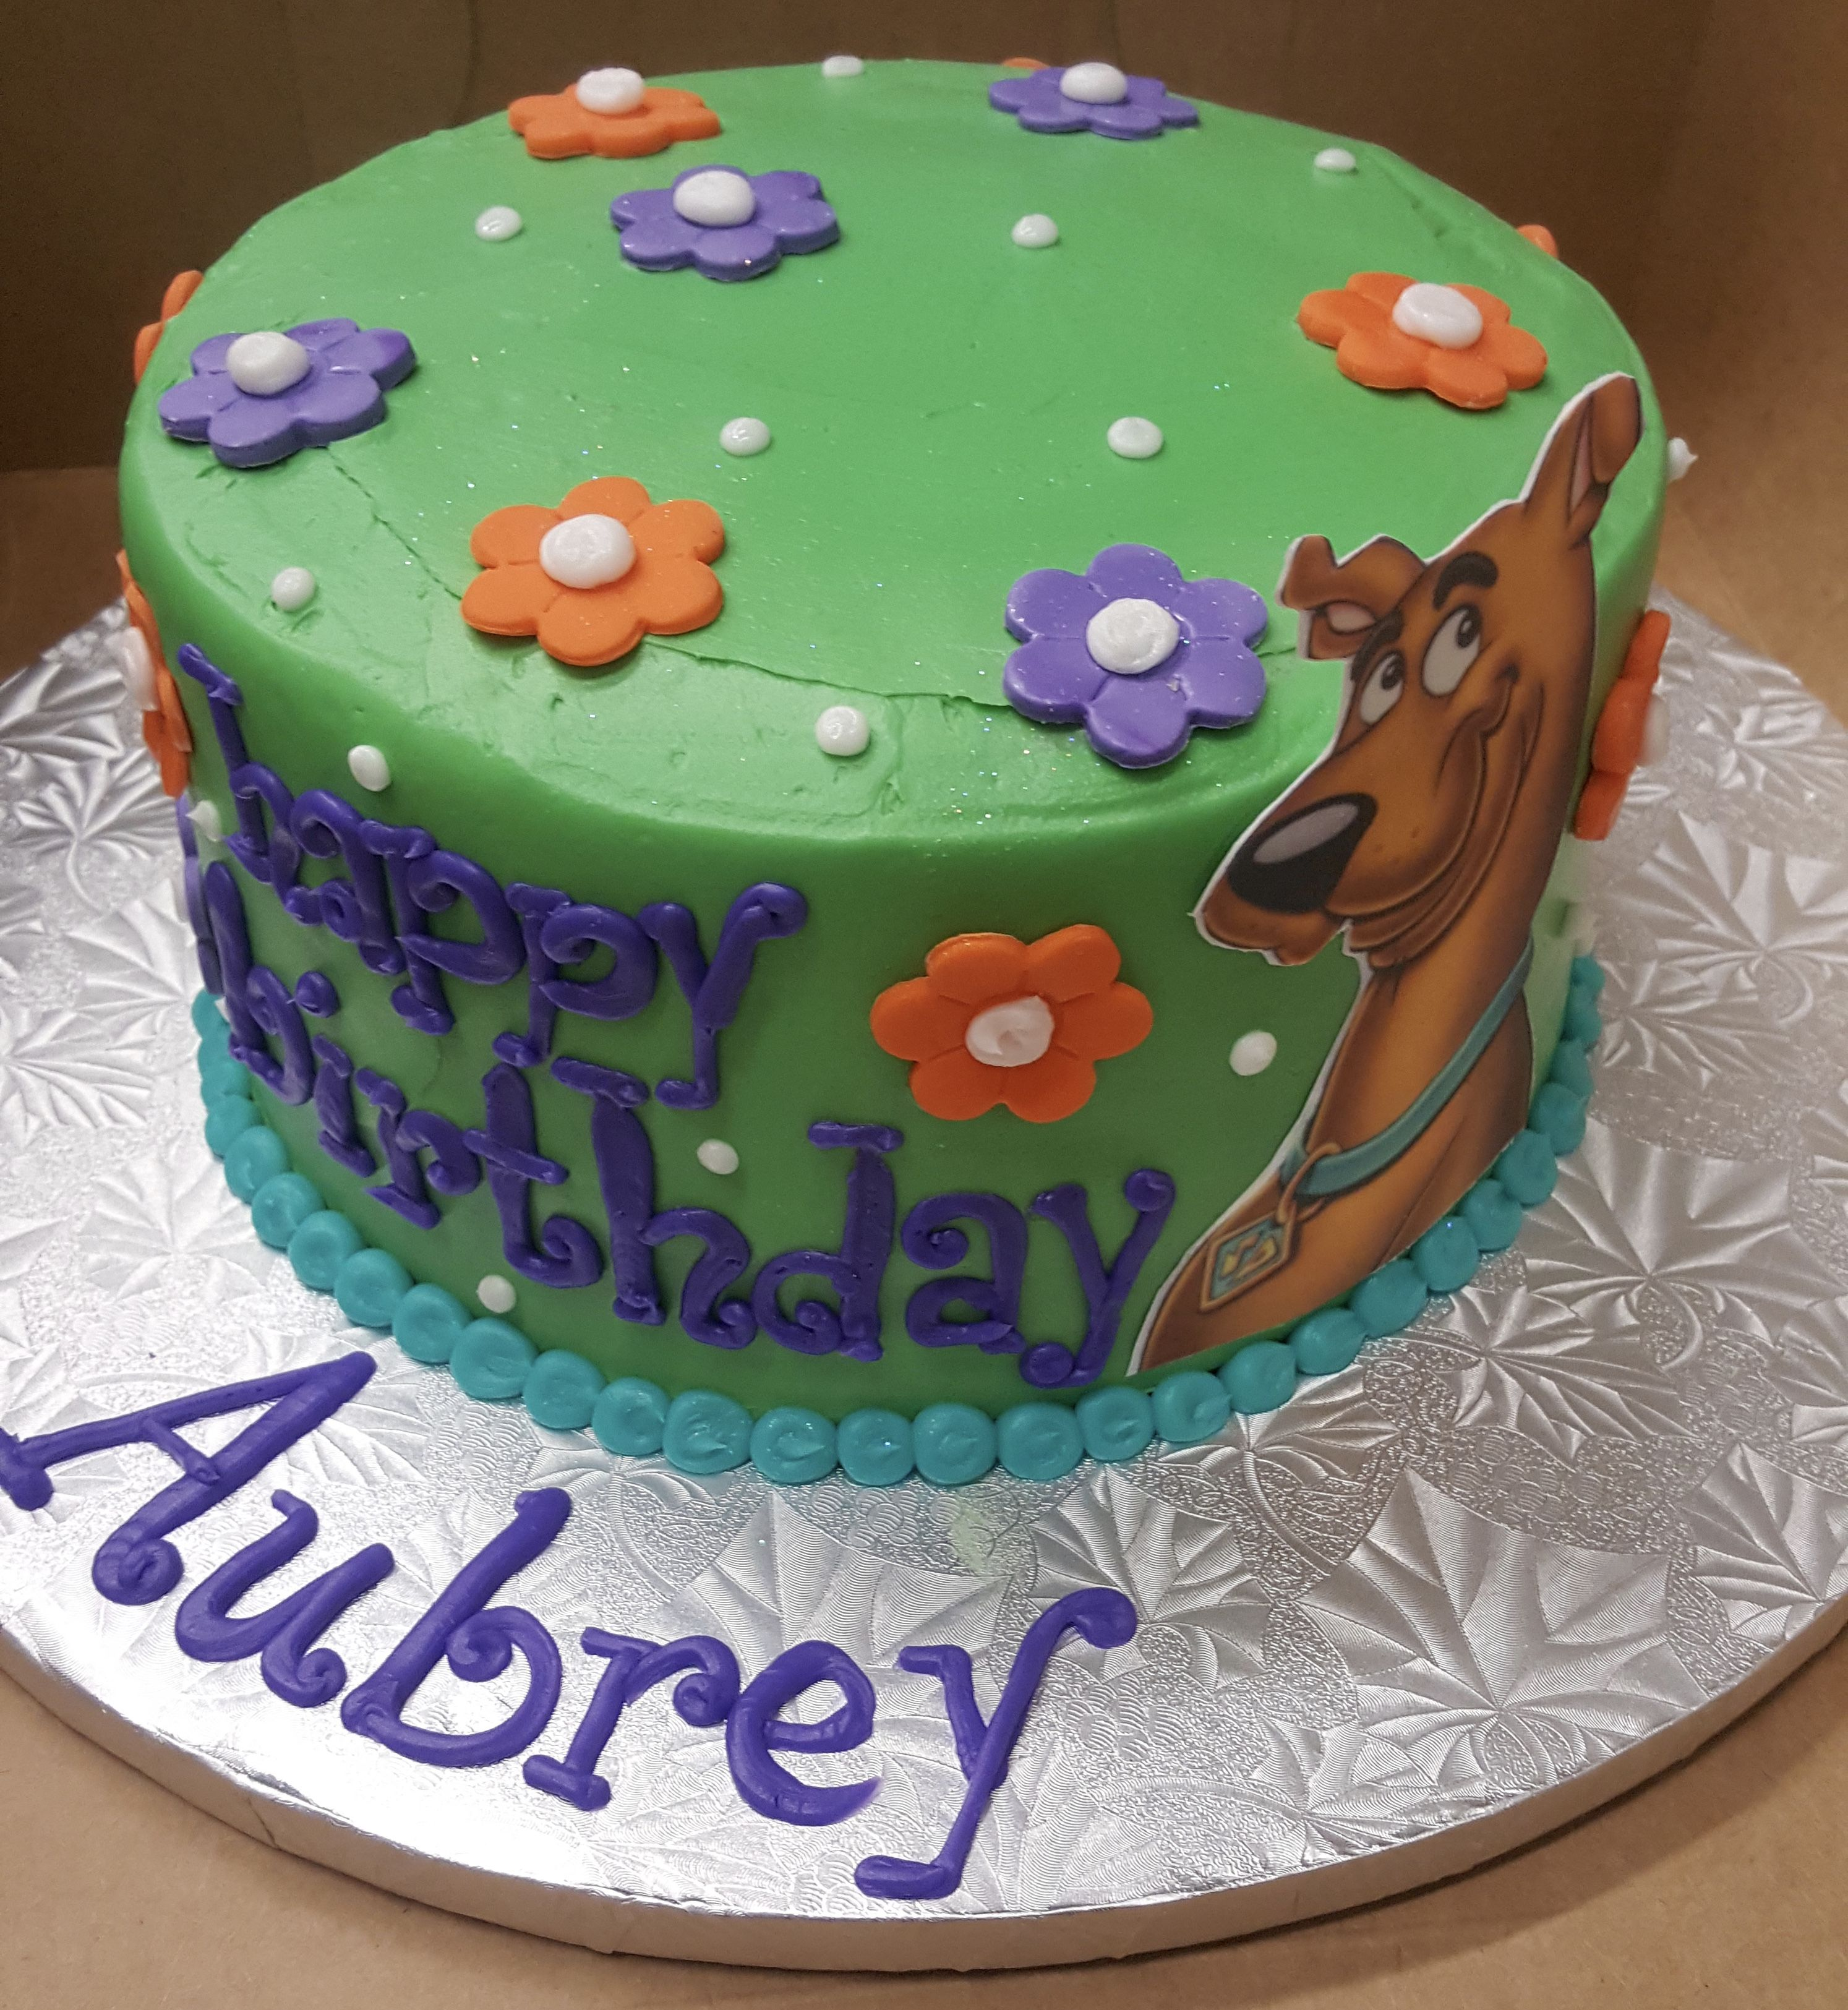 Calumet bakery birthday cake with character edible image